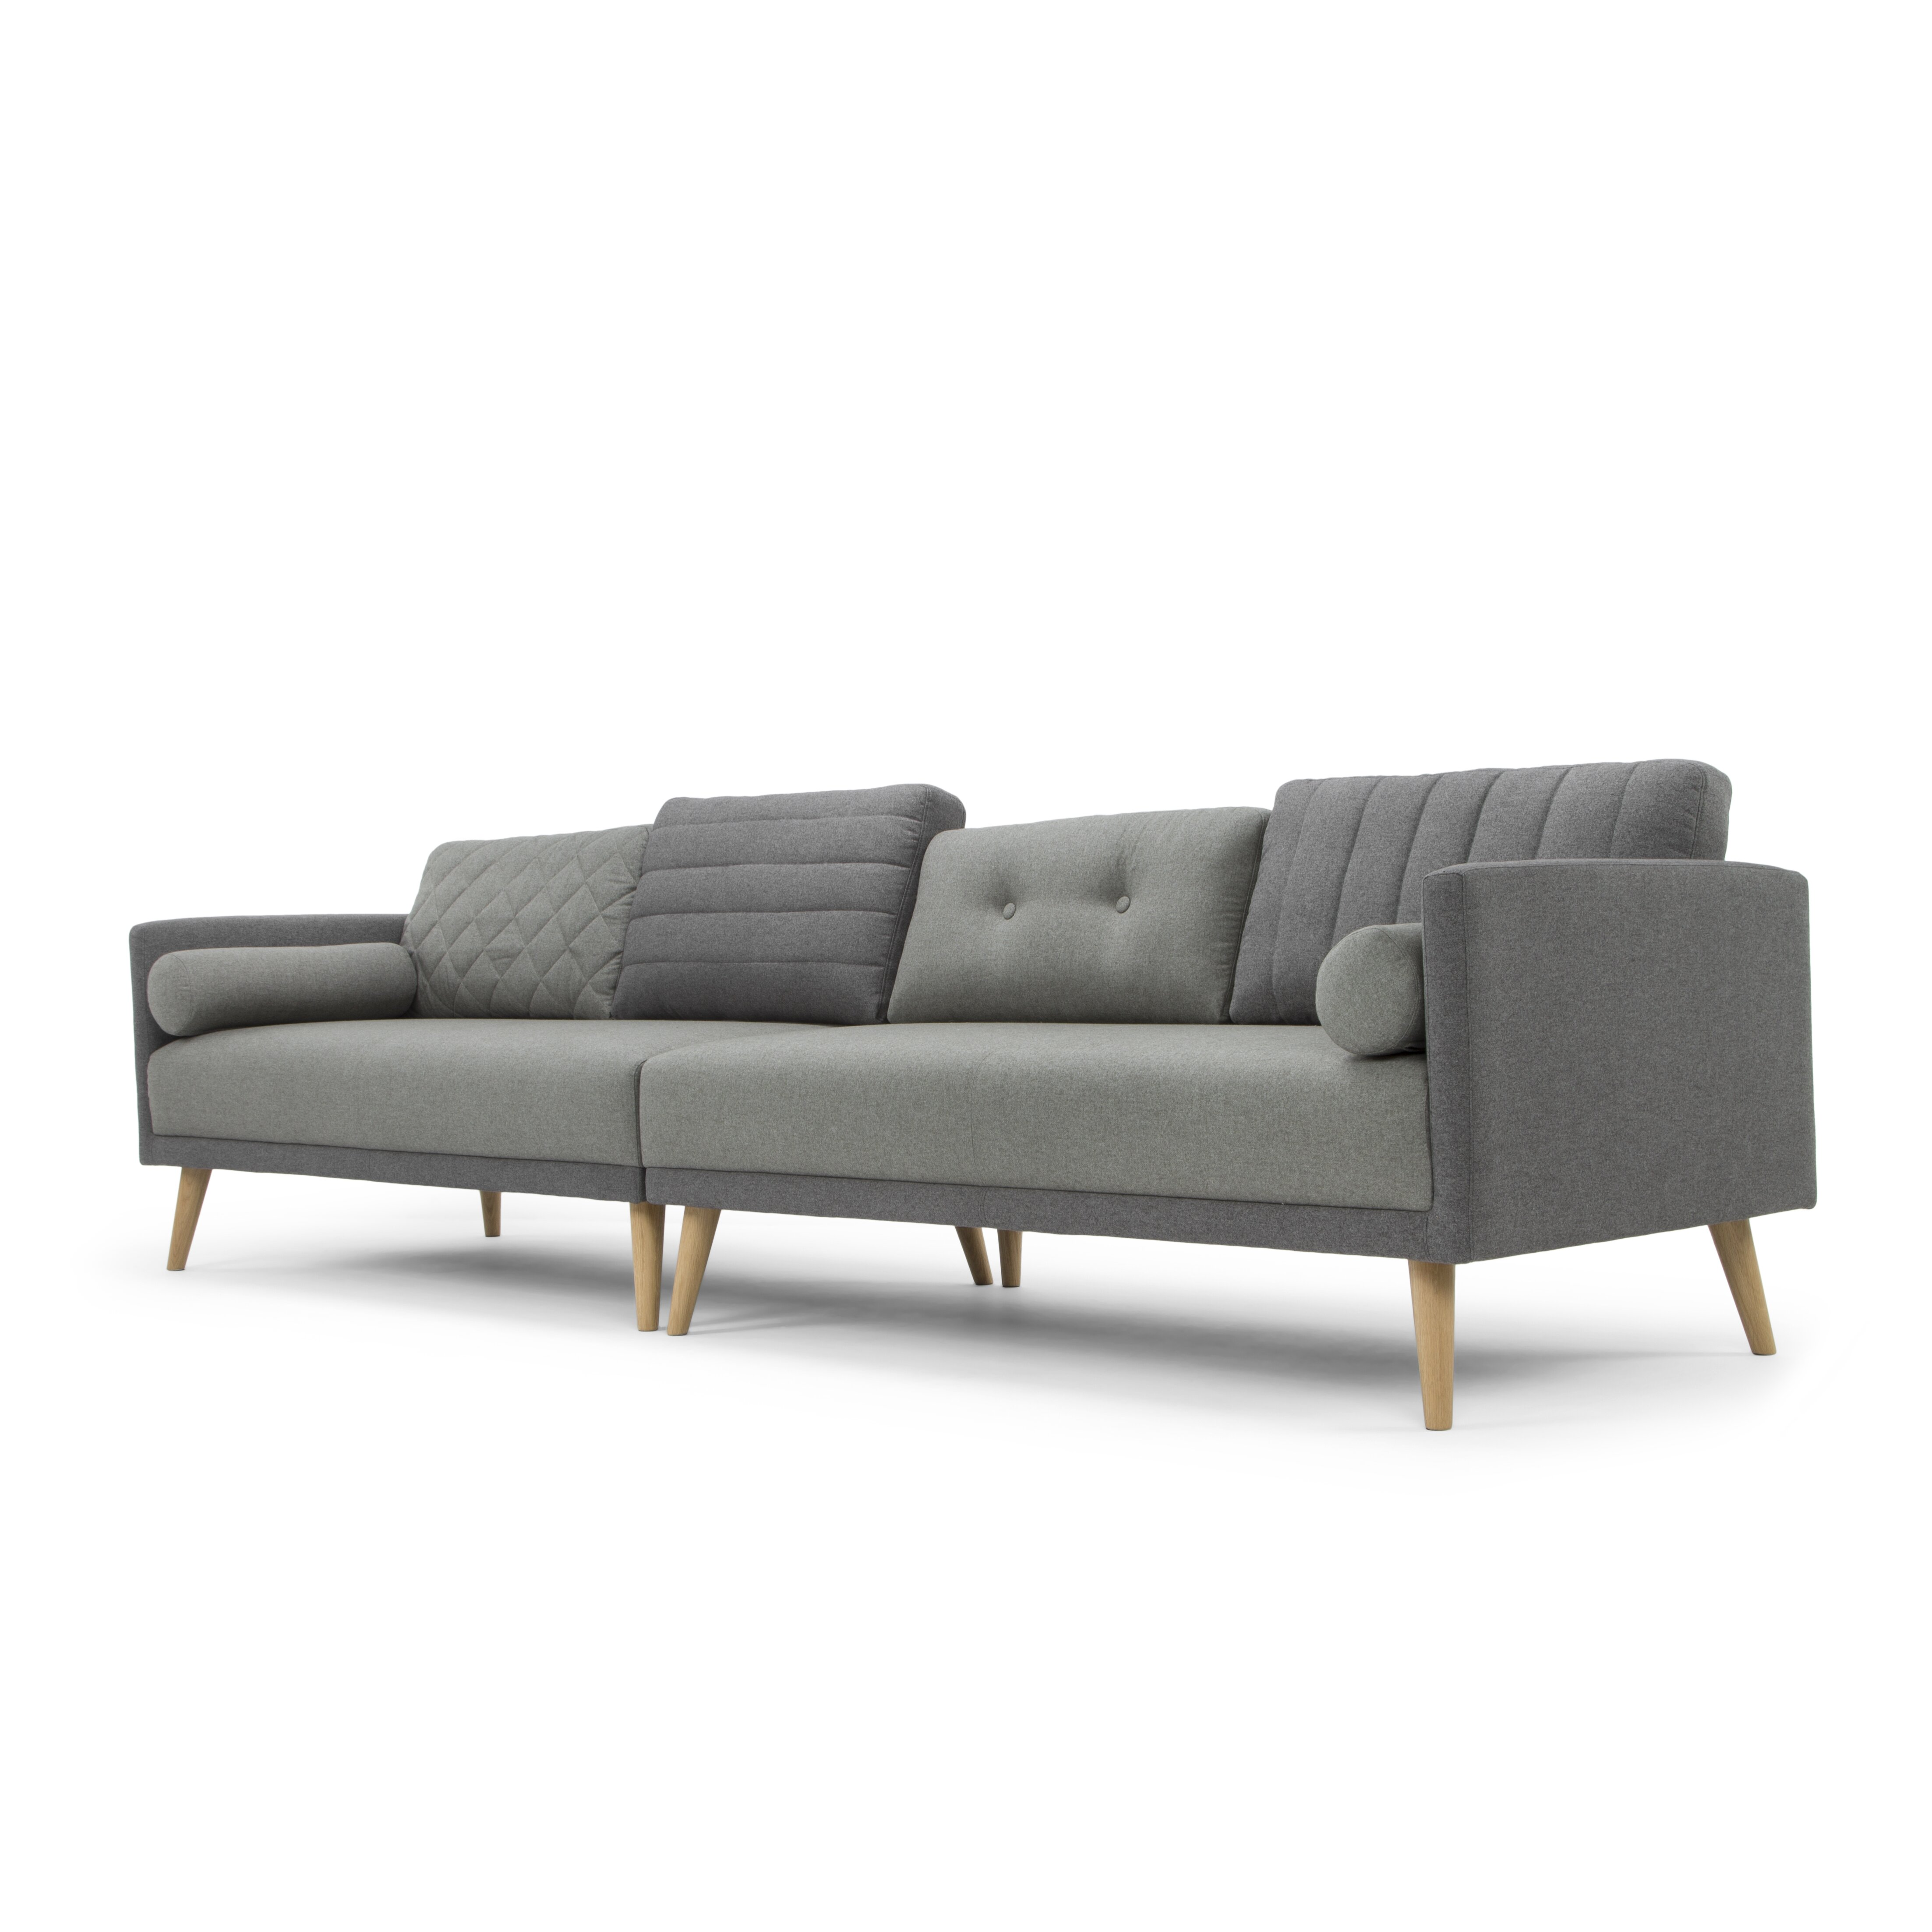 Nordic upholstery ragnar modern sofa wayfair for Sofa nordic